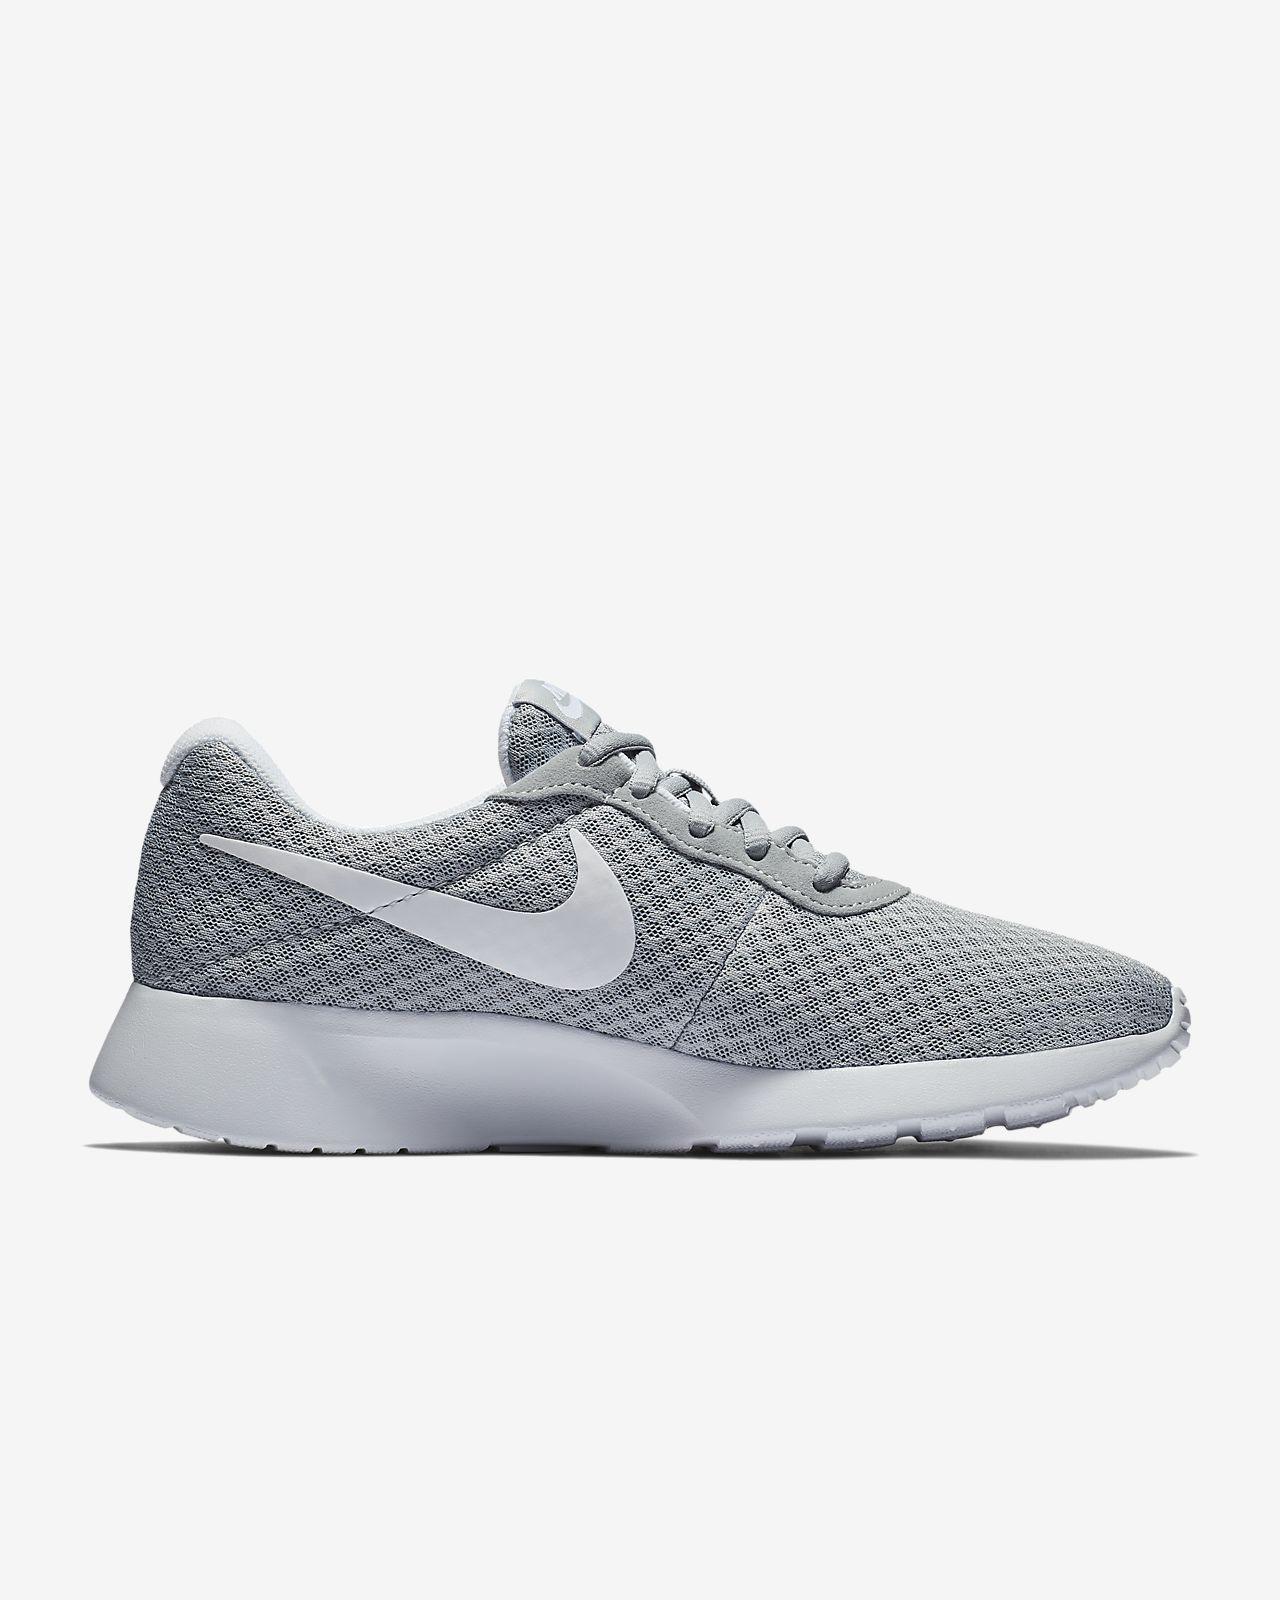 Ashin Modernes Chaussures Nike Rose W rwbLQ